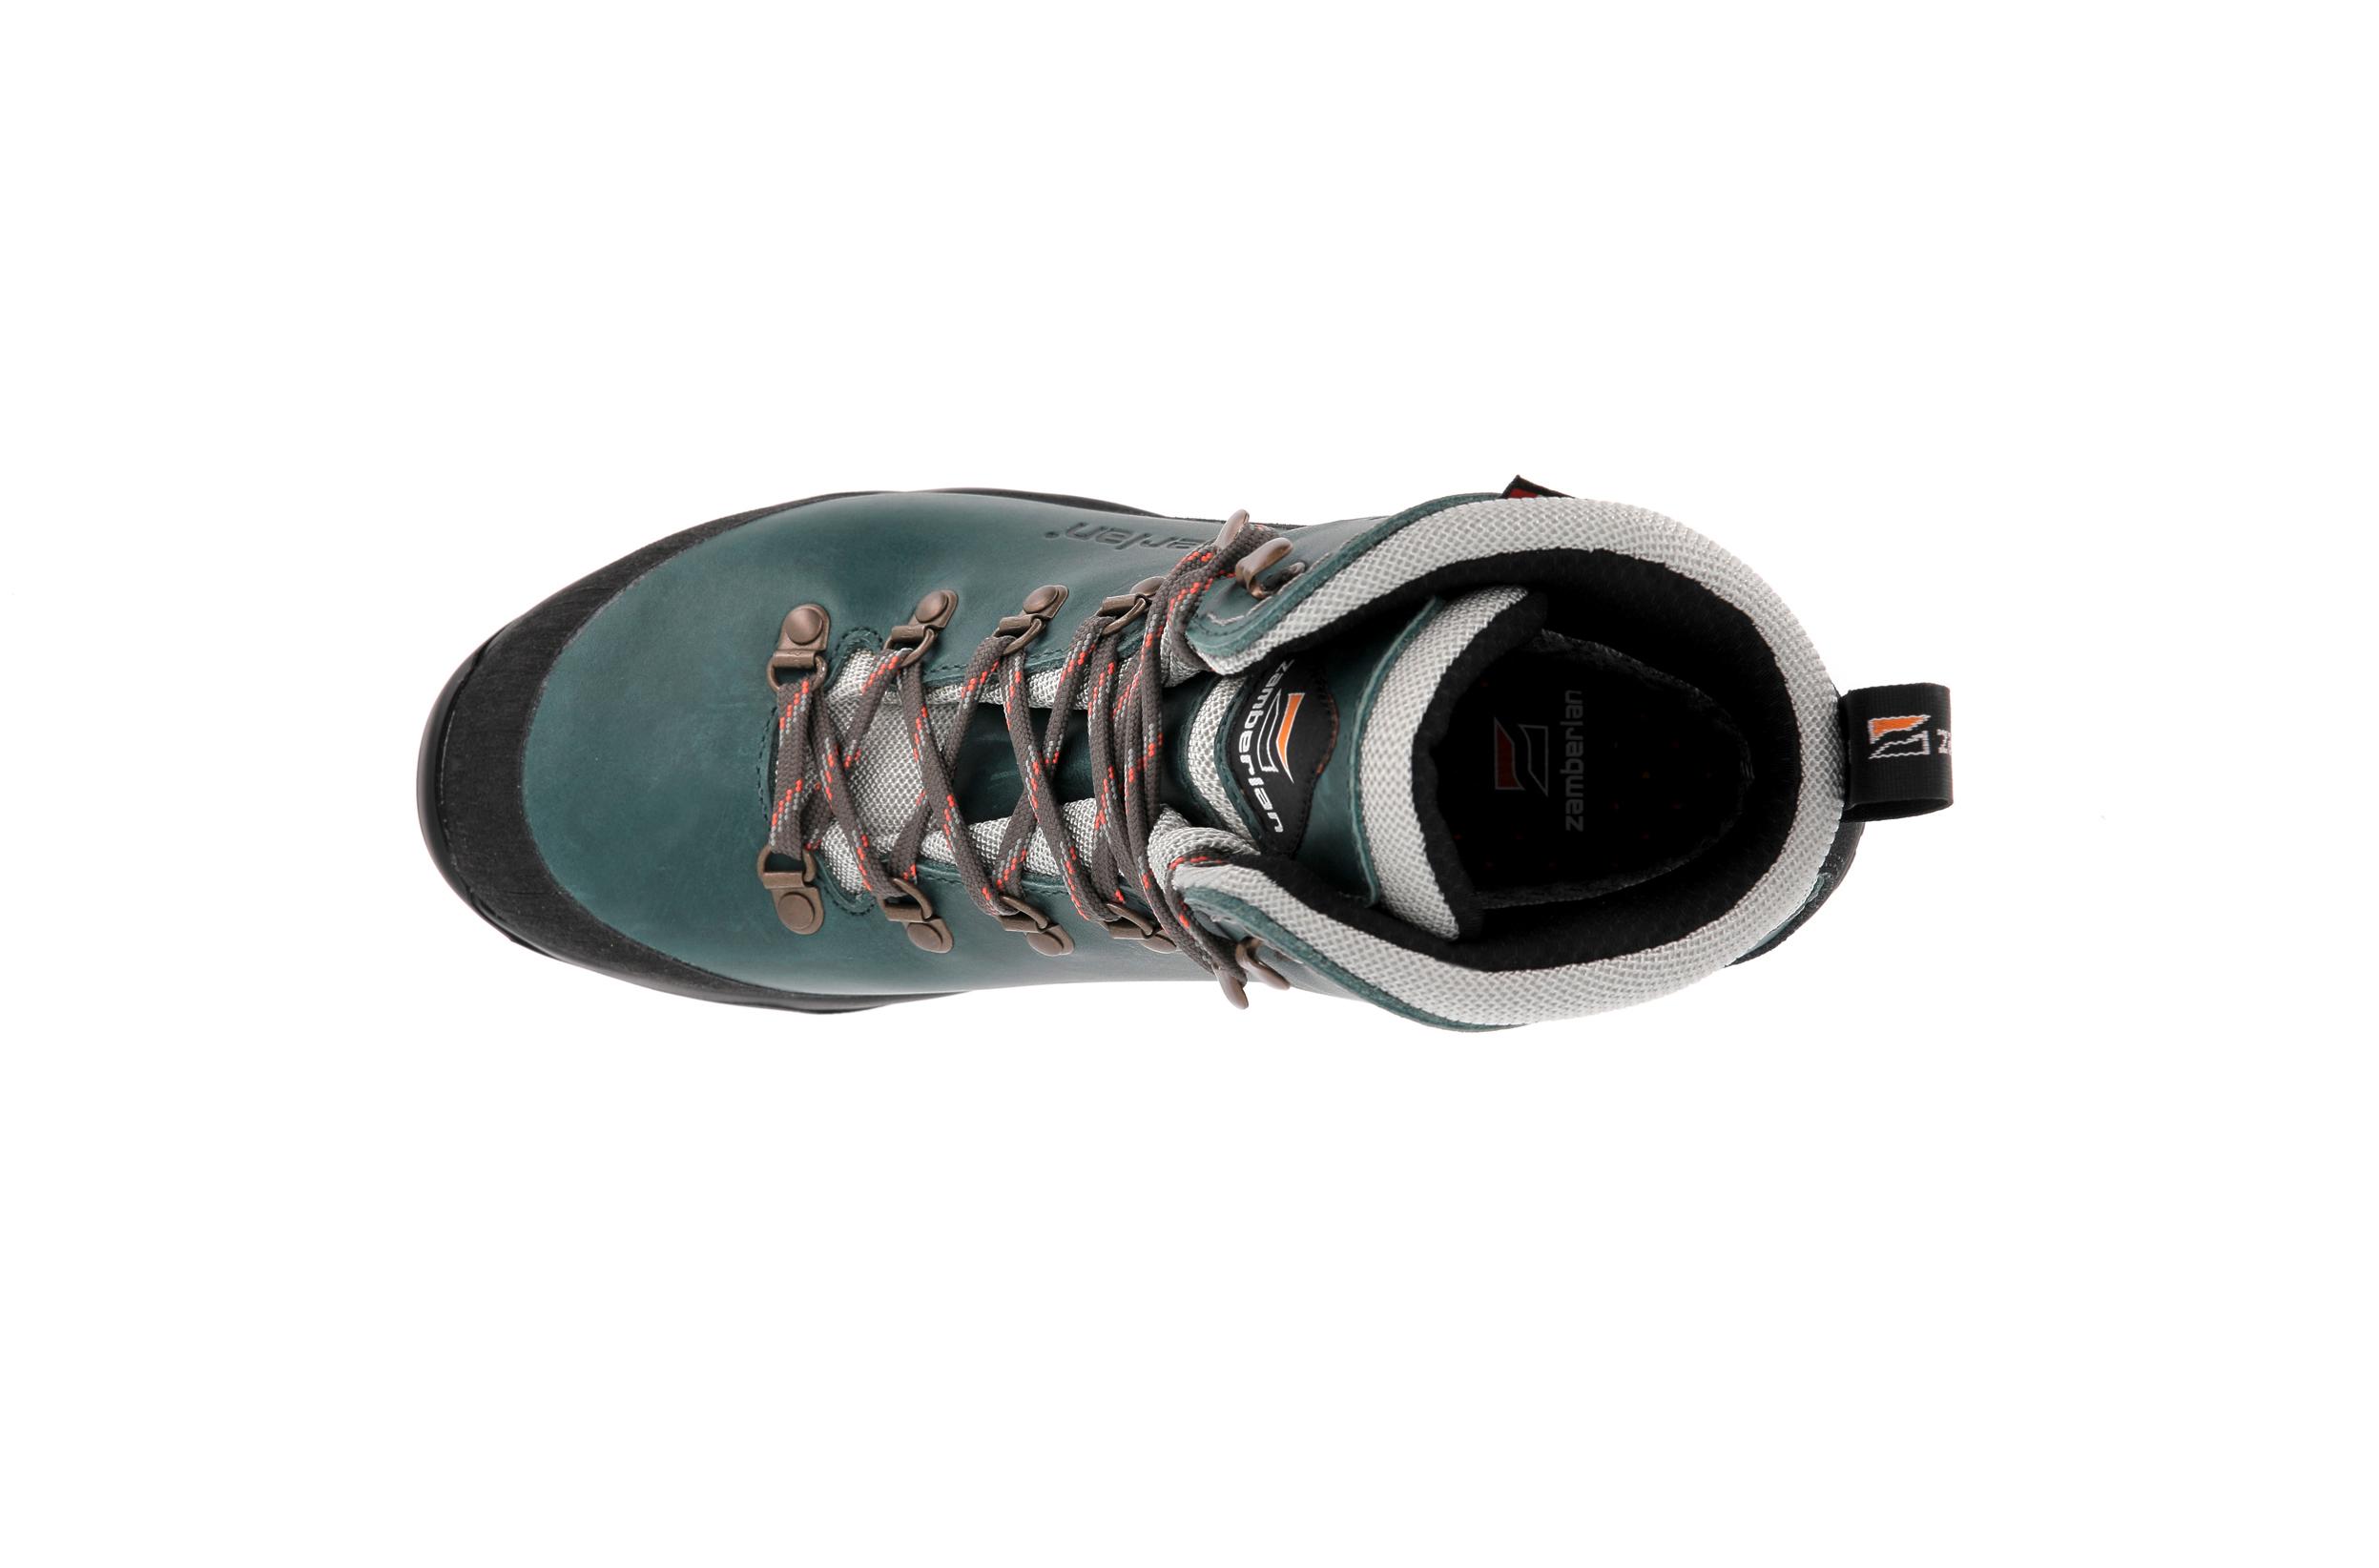 4f020492bf9 Zamberlan 330 Marie Gore-Tex Backpacking Boots - Women's